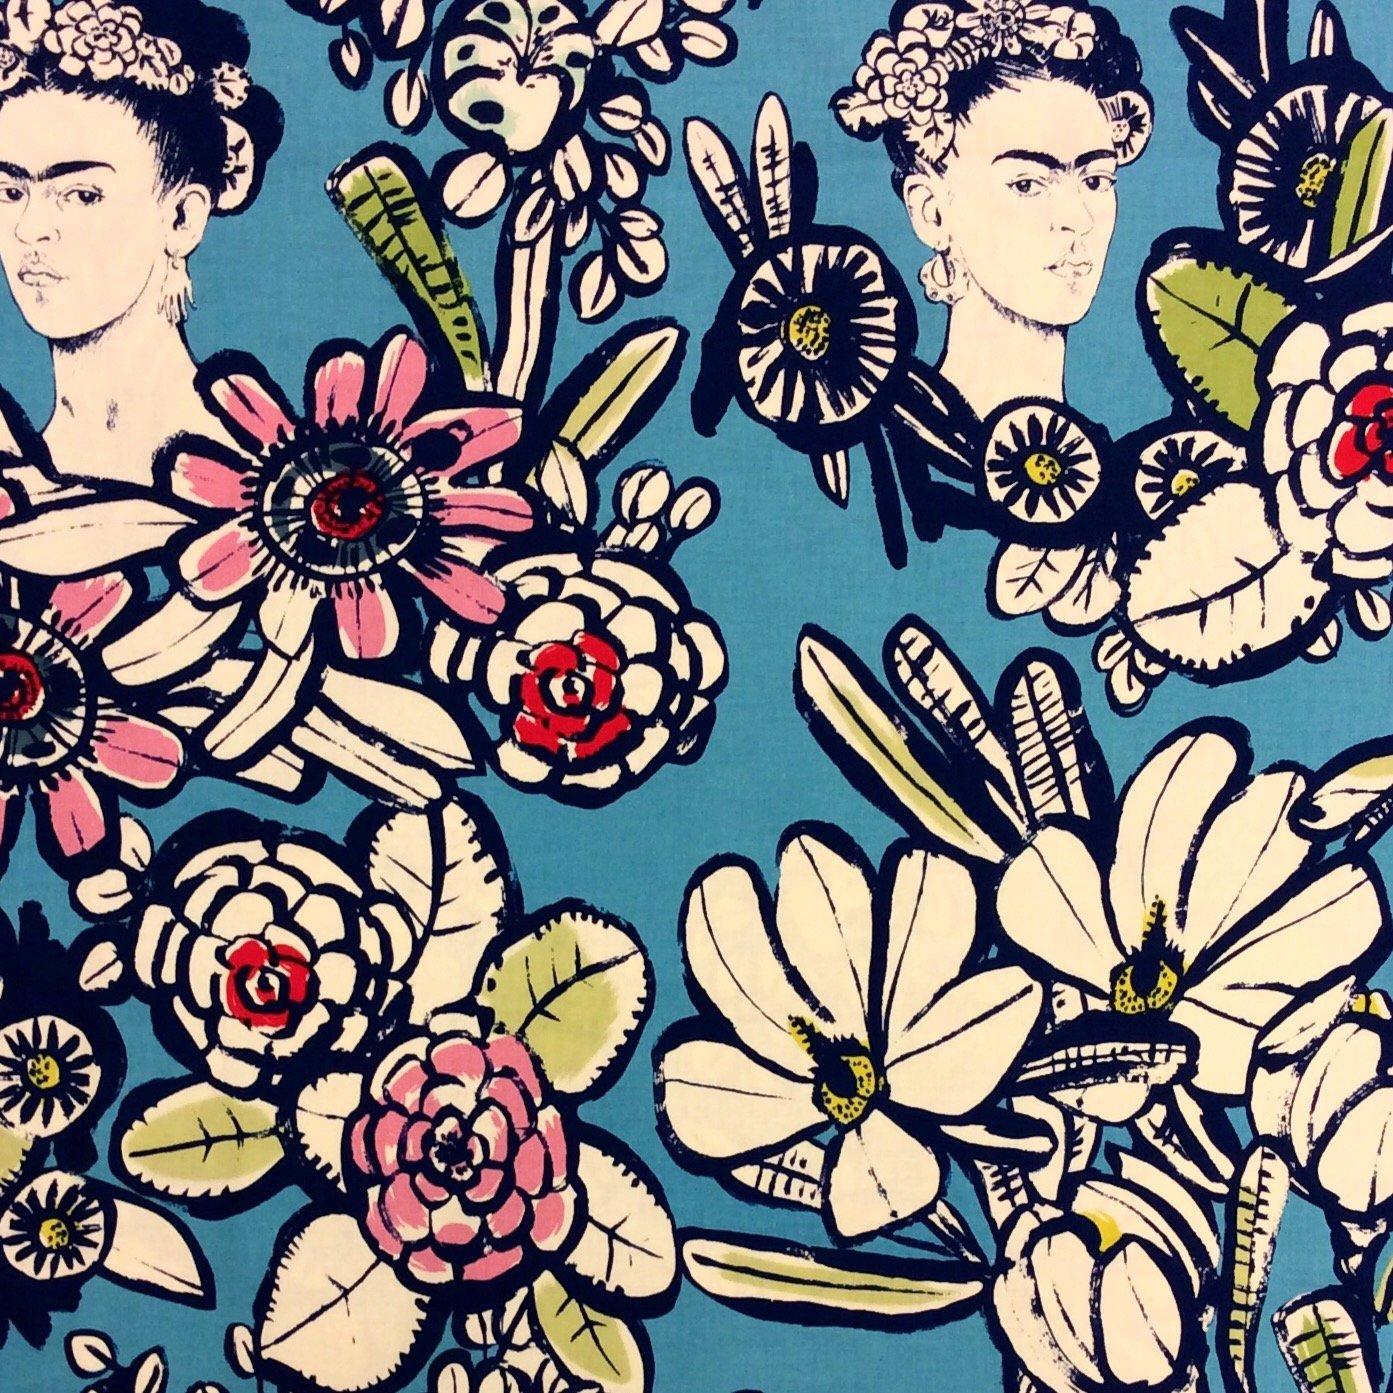 Frida Kahlo Mexico Latin Art Cotton Quilt Fabric AH190